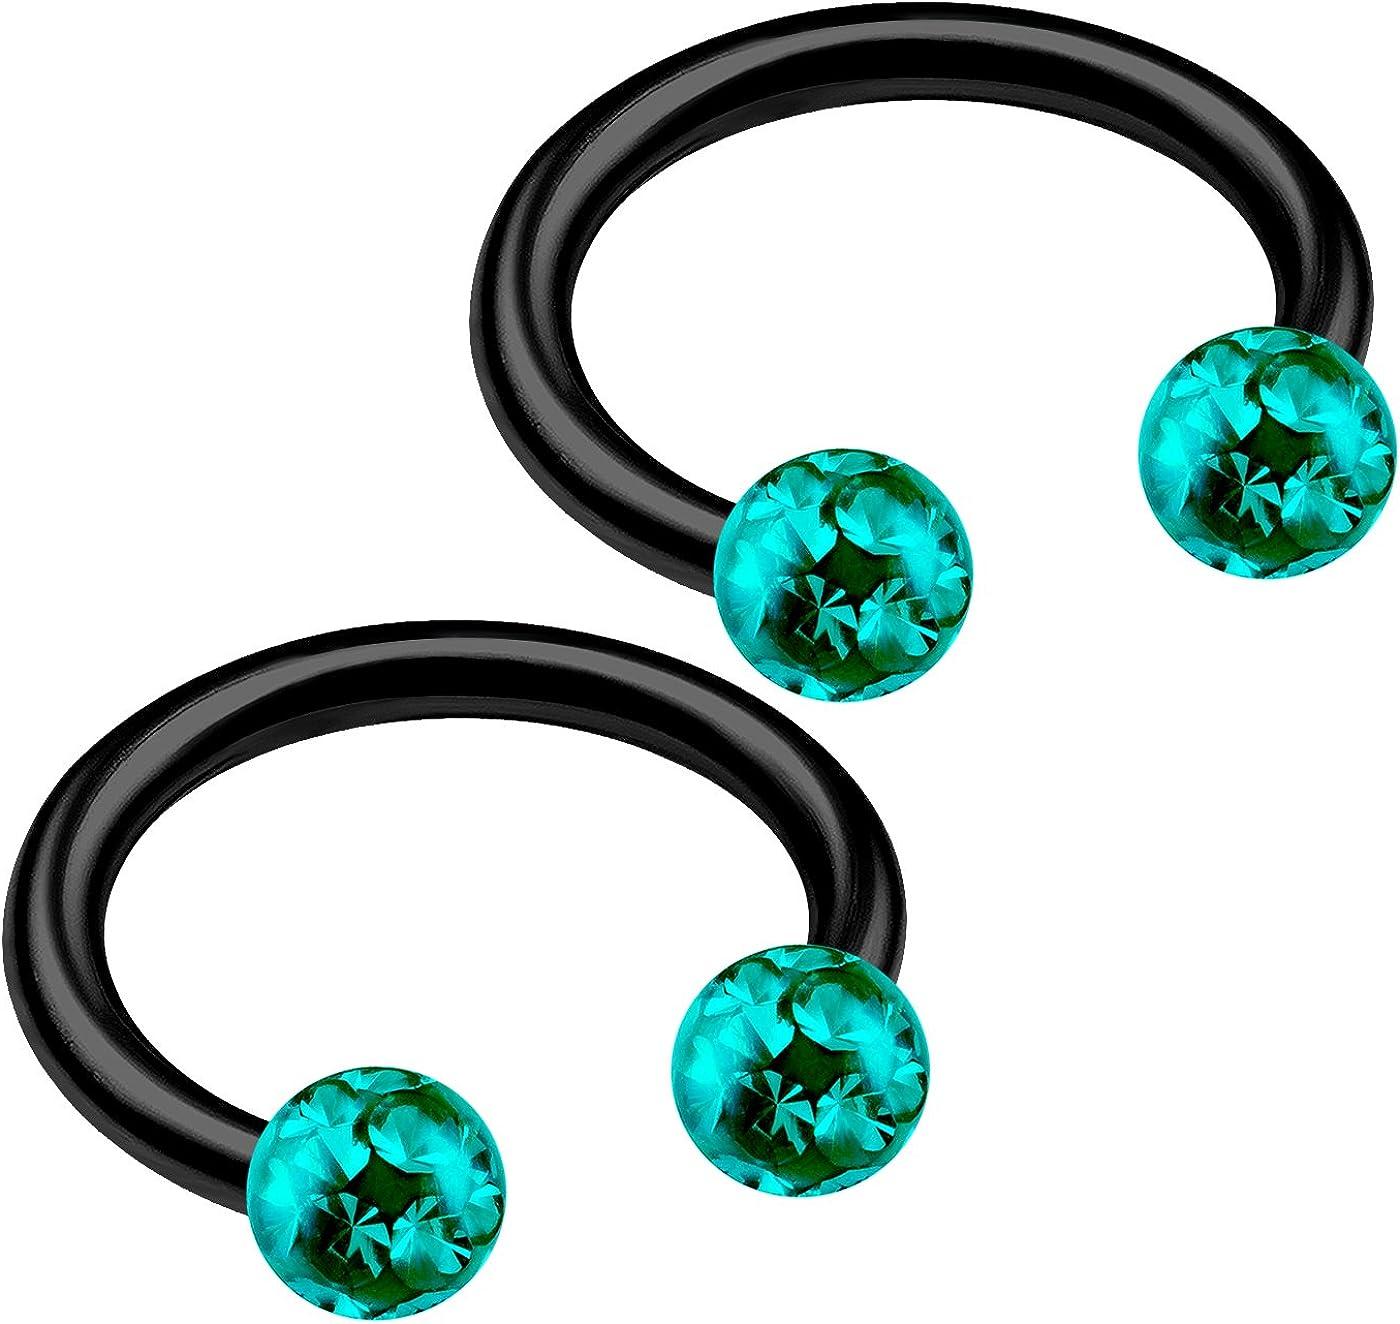 bodyjewellery 2pcs 16g Circular Barbell Black Titanium G23 Ear Helix Lip Eyebrow Tragus Nose Snake Septum Cartilage Bite Ring B2ICT